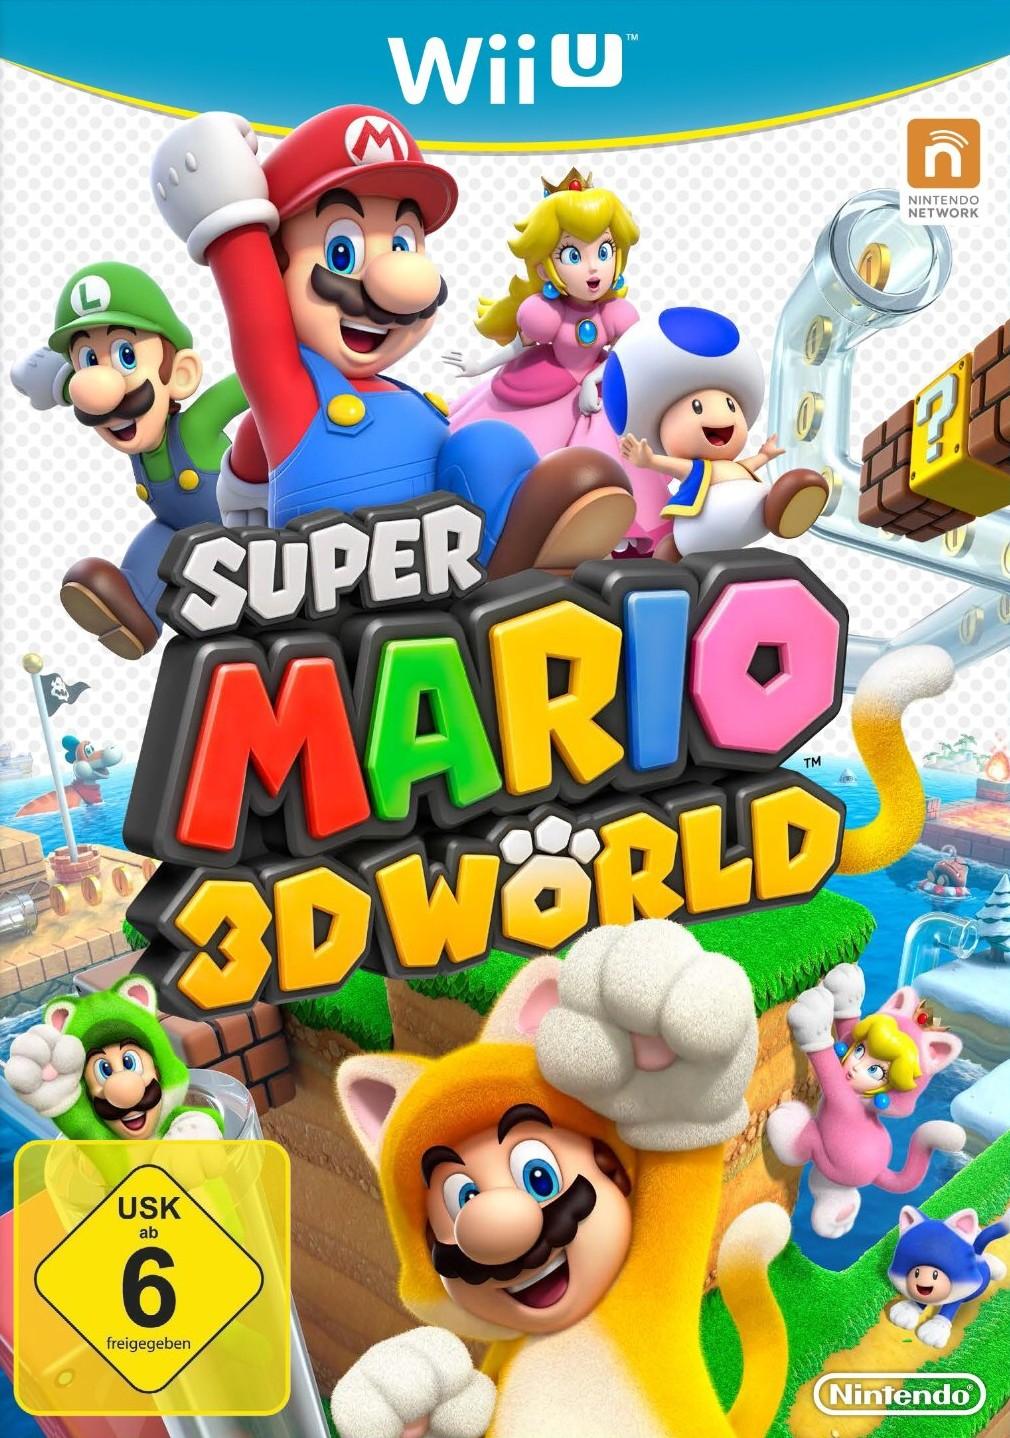 GOTY2013-Super-Mario-3D-World